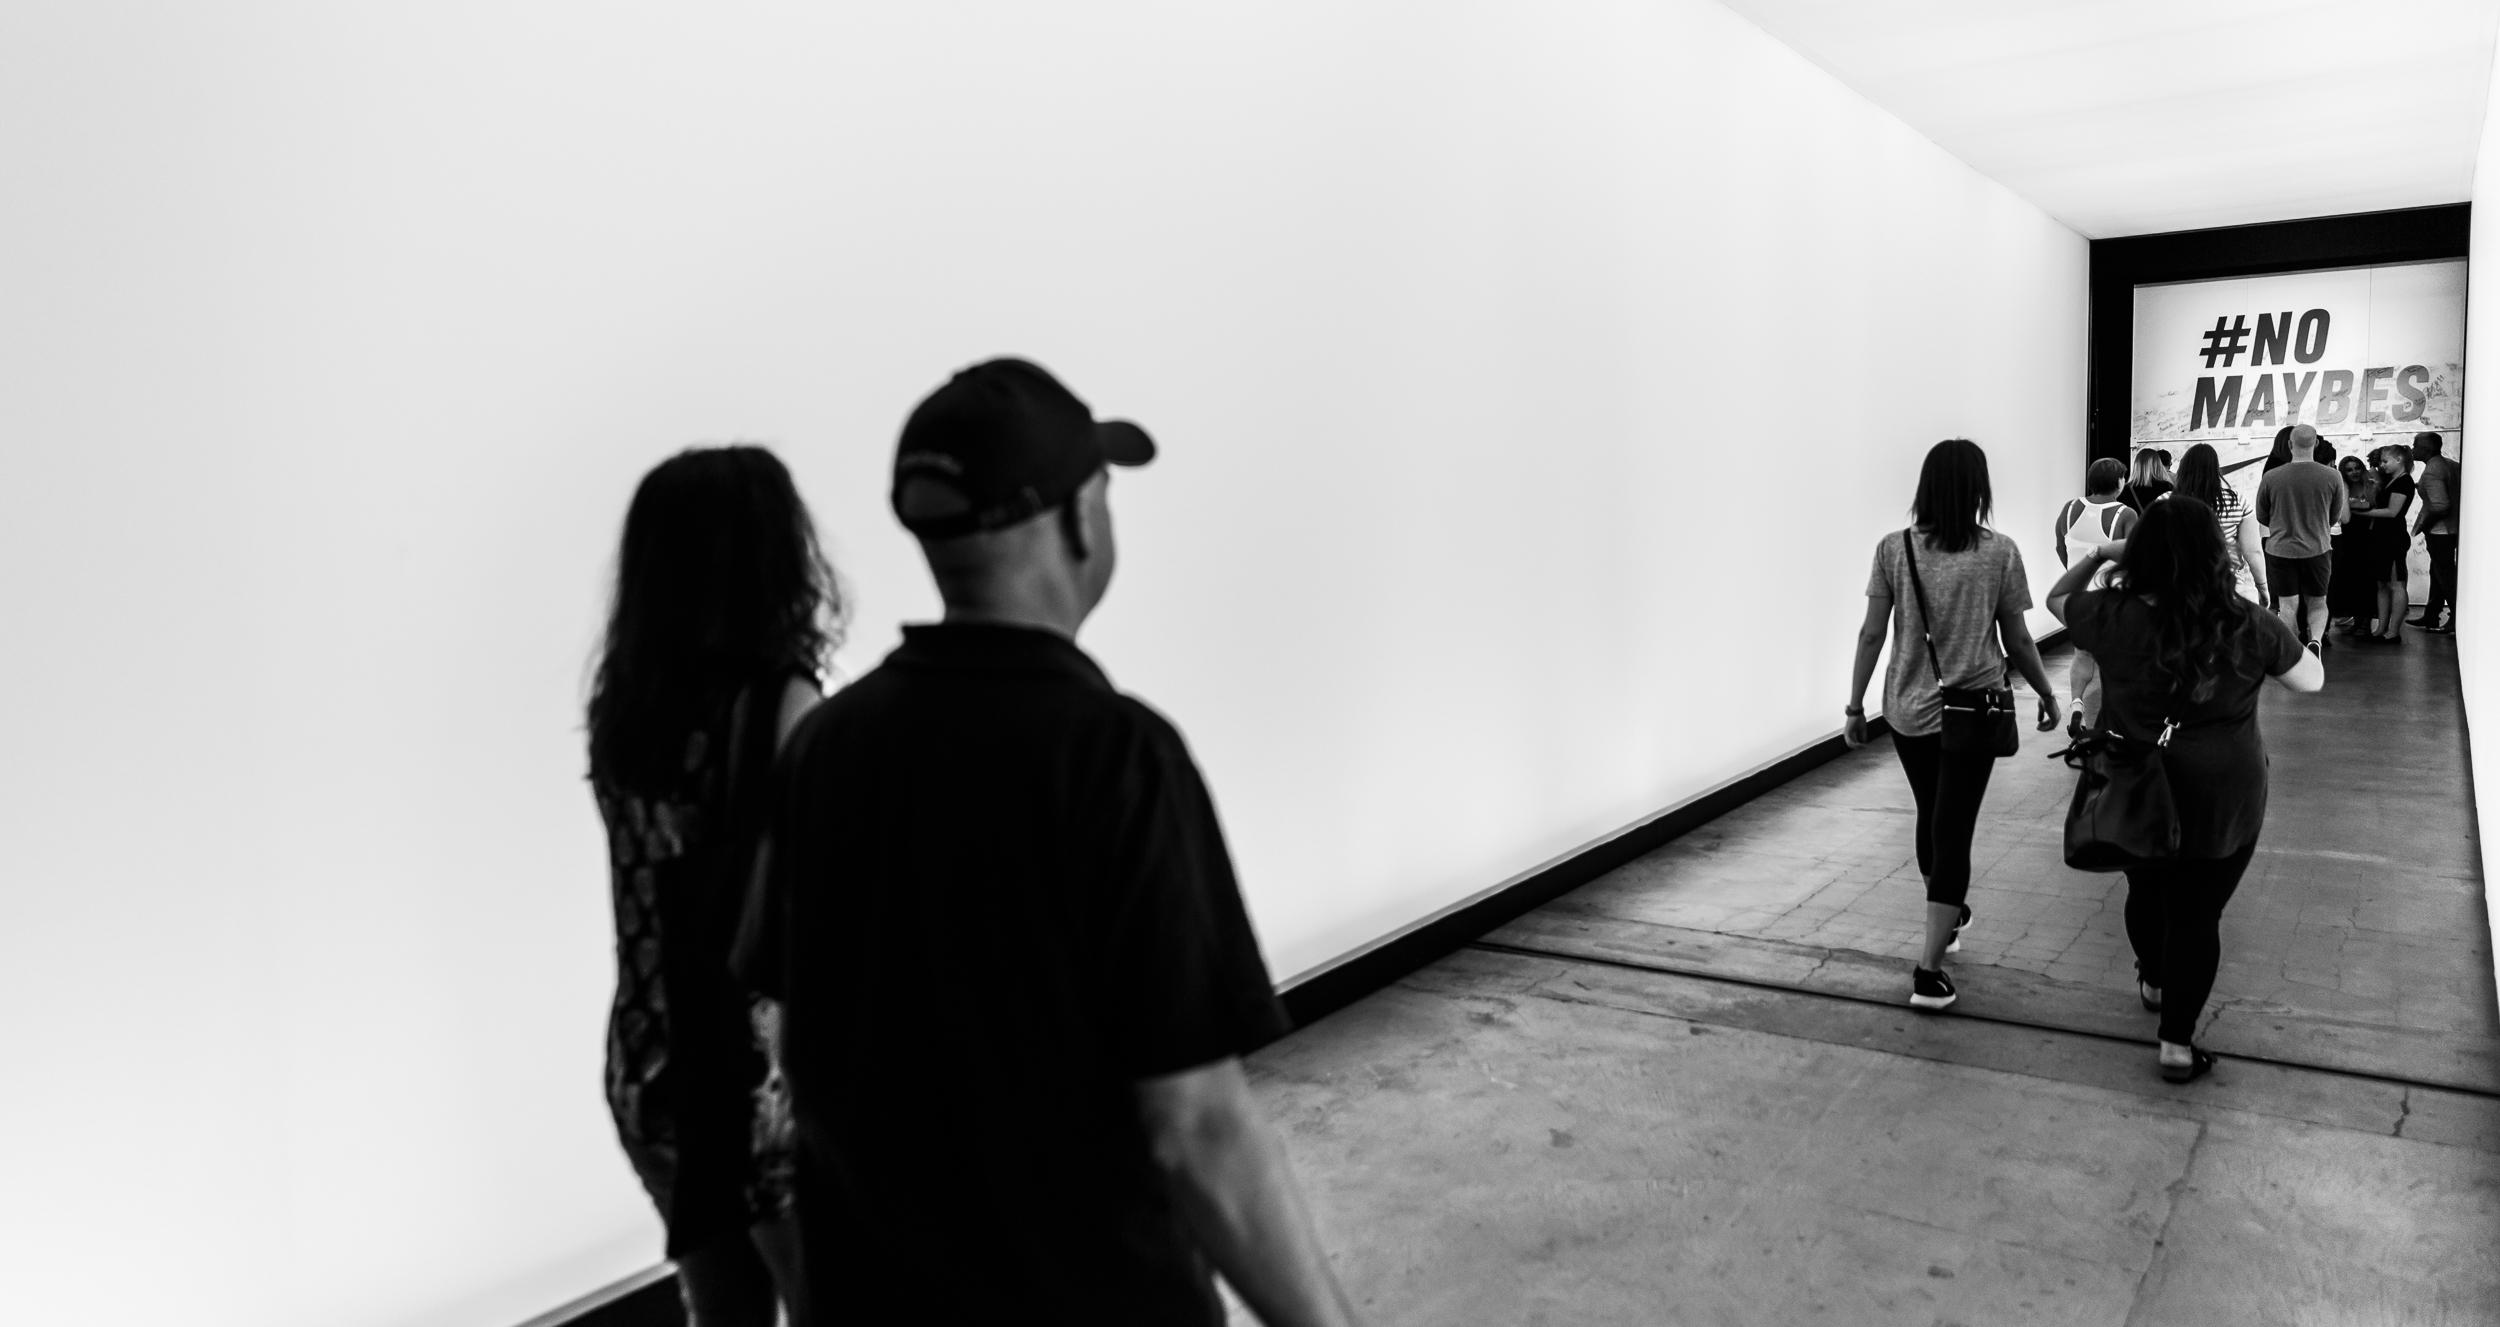 NIKE-Underground-image15.jpg